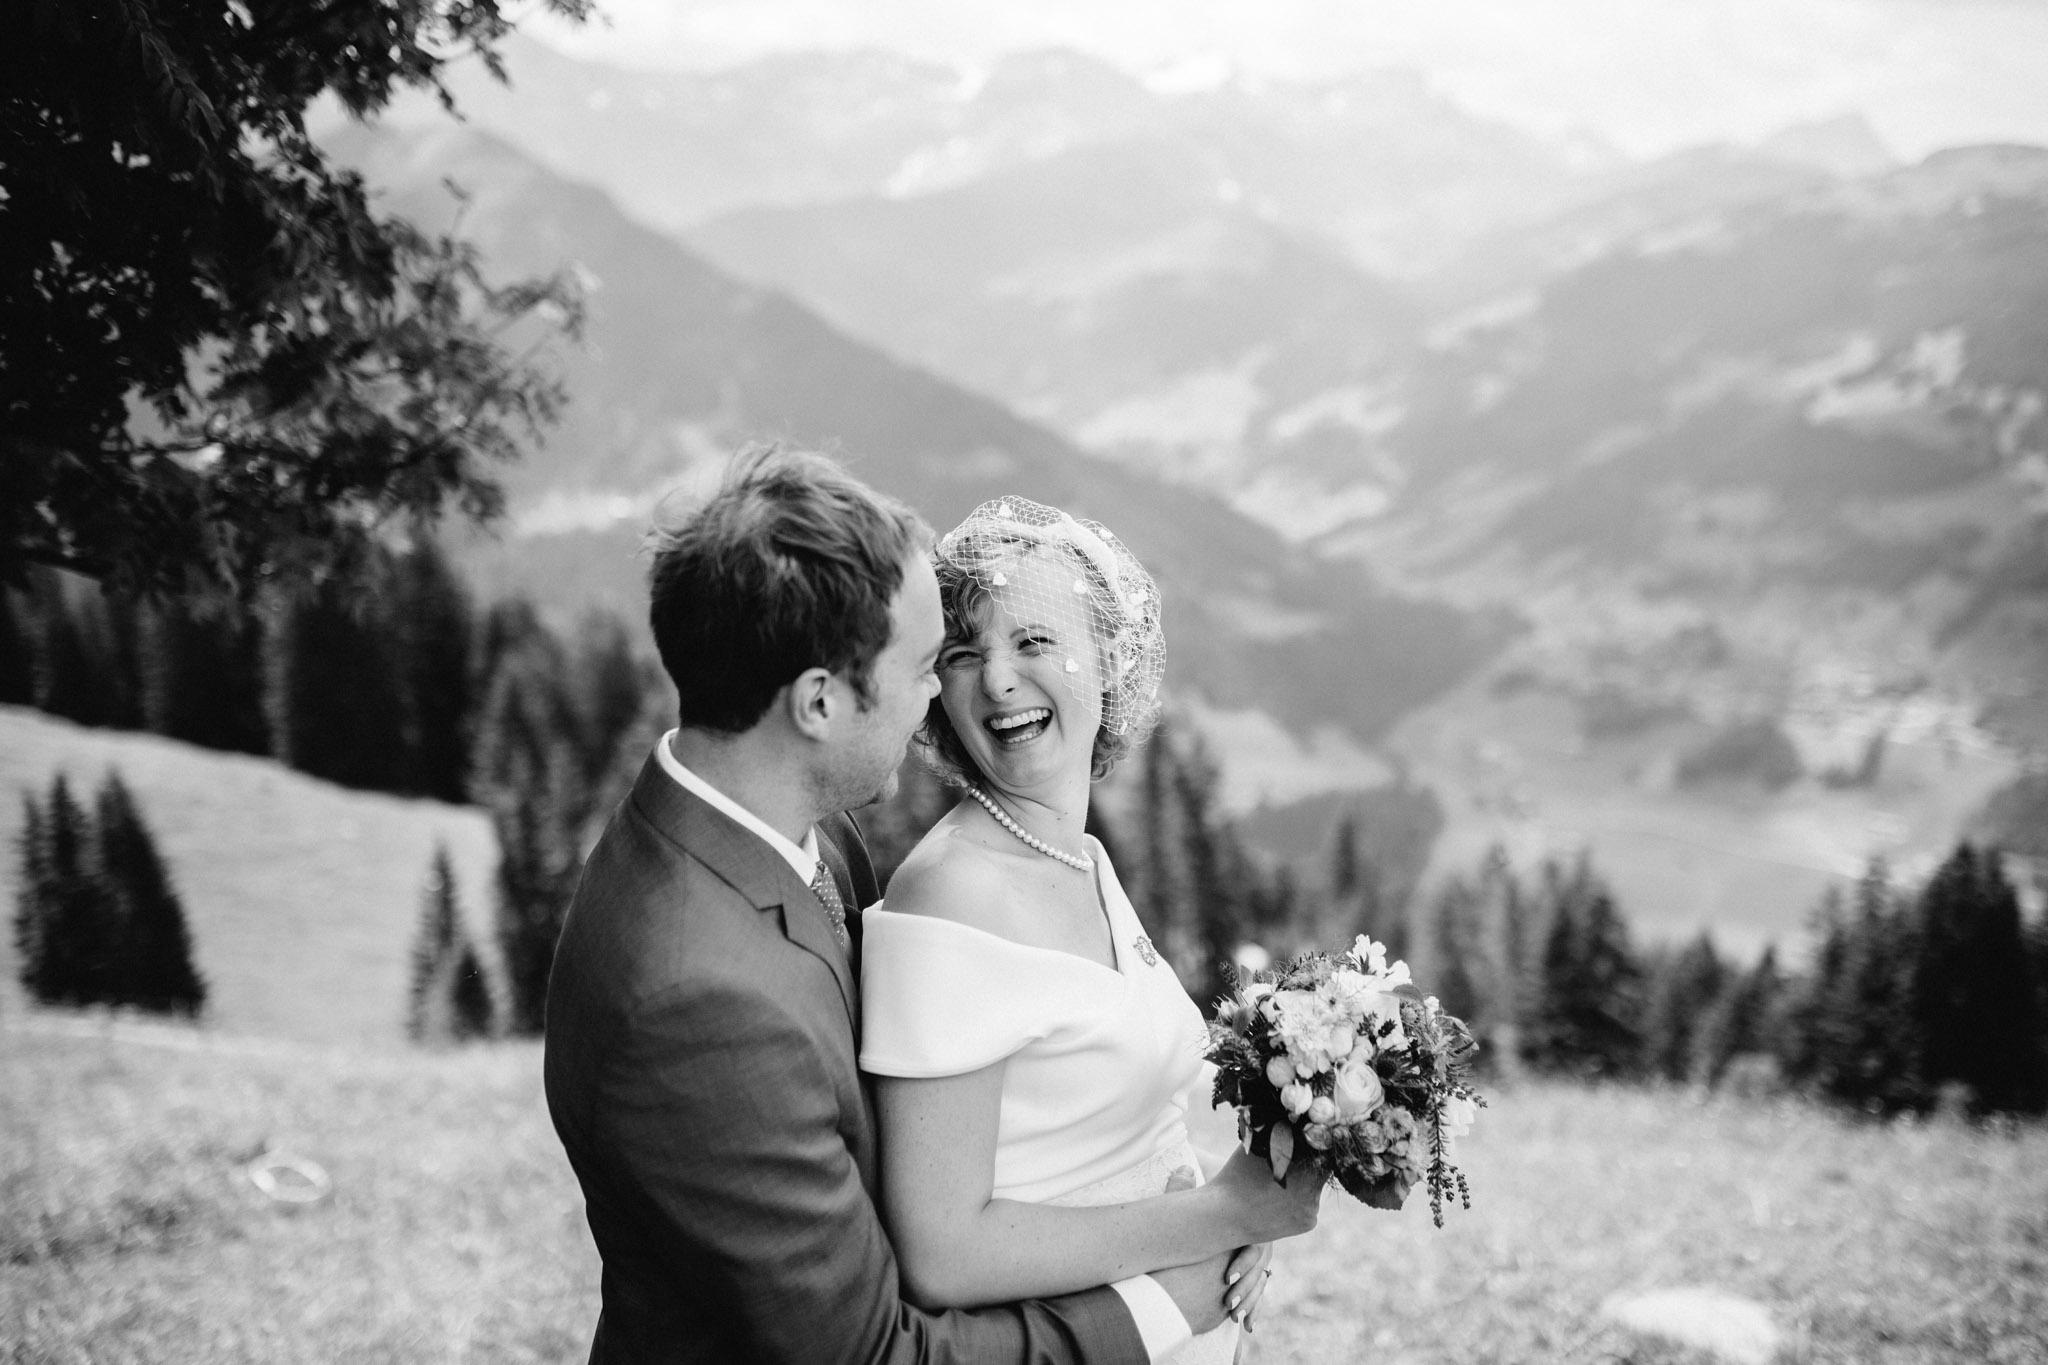 Lenl-Simmental-Buehlerhof-Pia-Anna-Christian-Wedding-Photography-EK-38.jpg